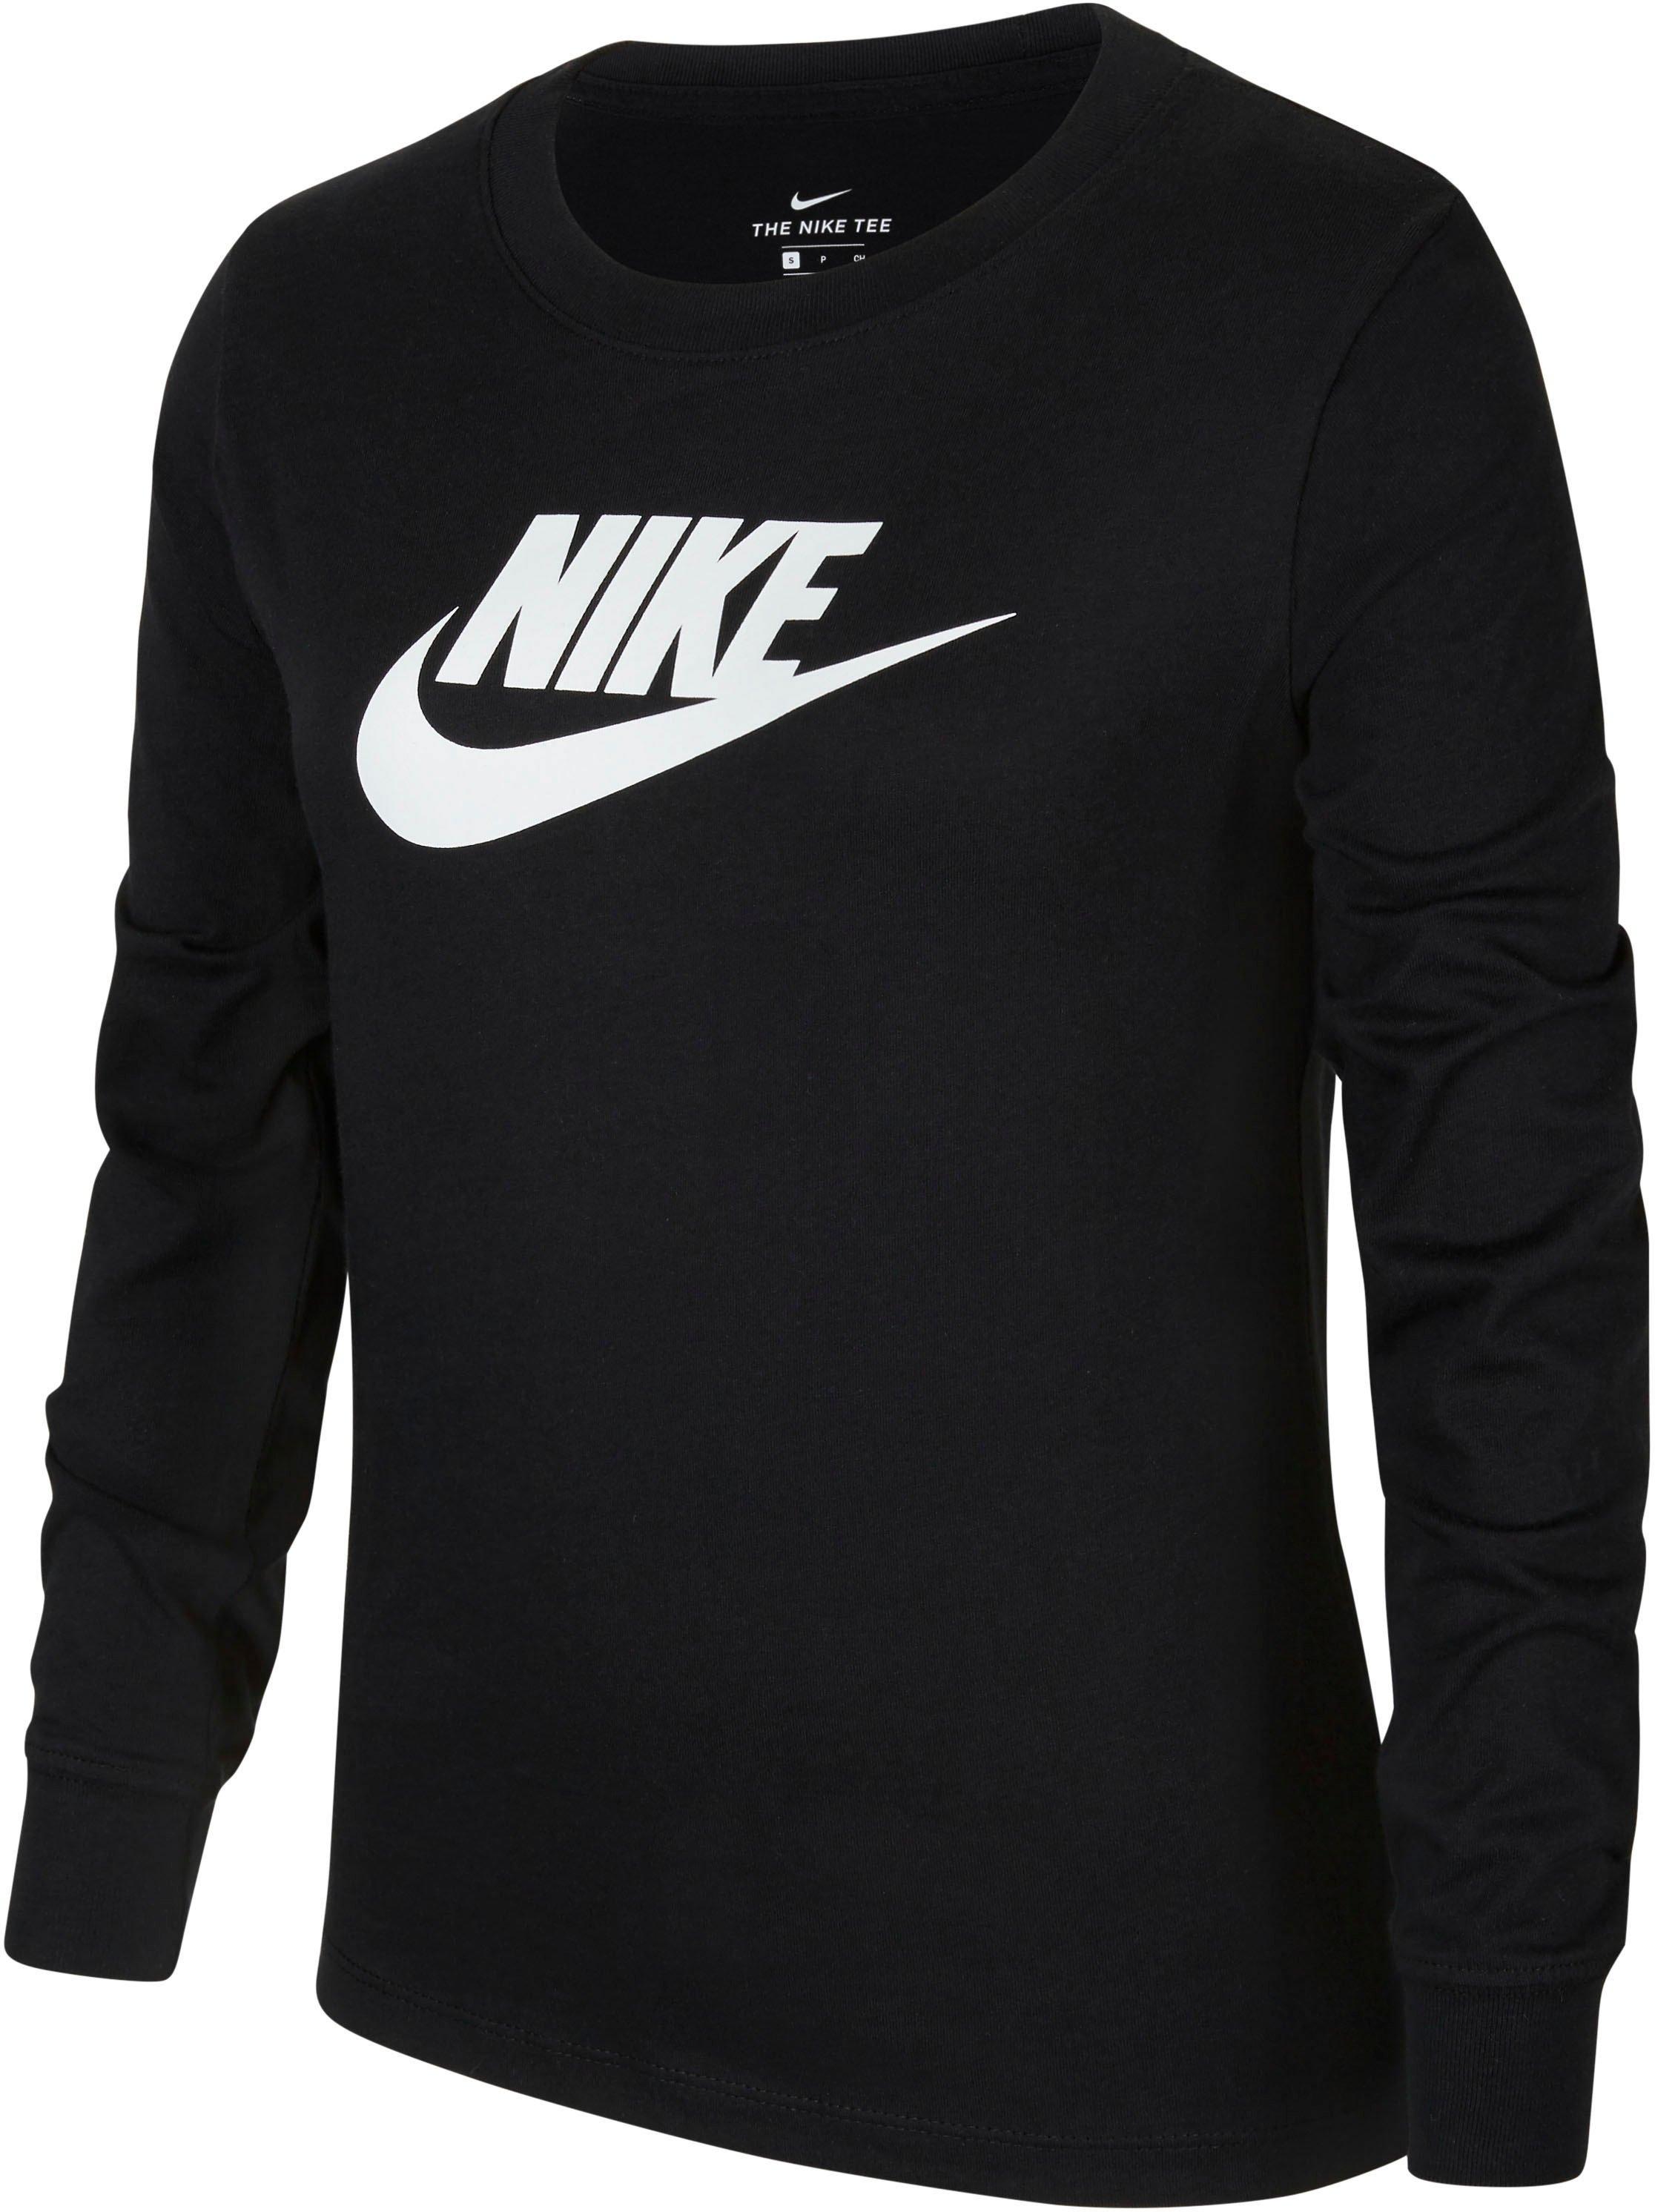 Nike Sportswear Shirt met lange mouwen BIG KIDS (GIRLS) LONG-SLEEVE T-SHIRT bij OTTO online kopen